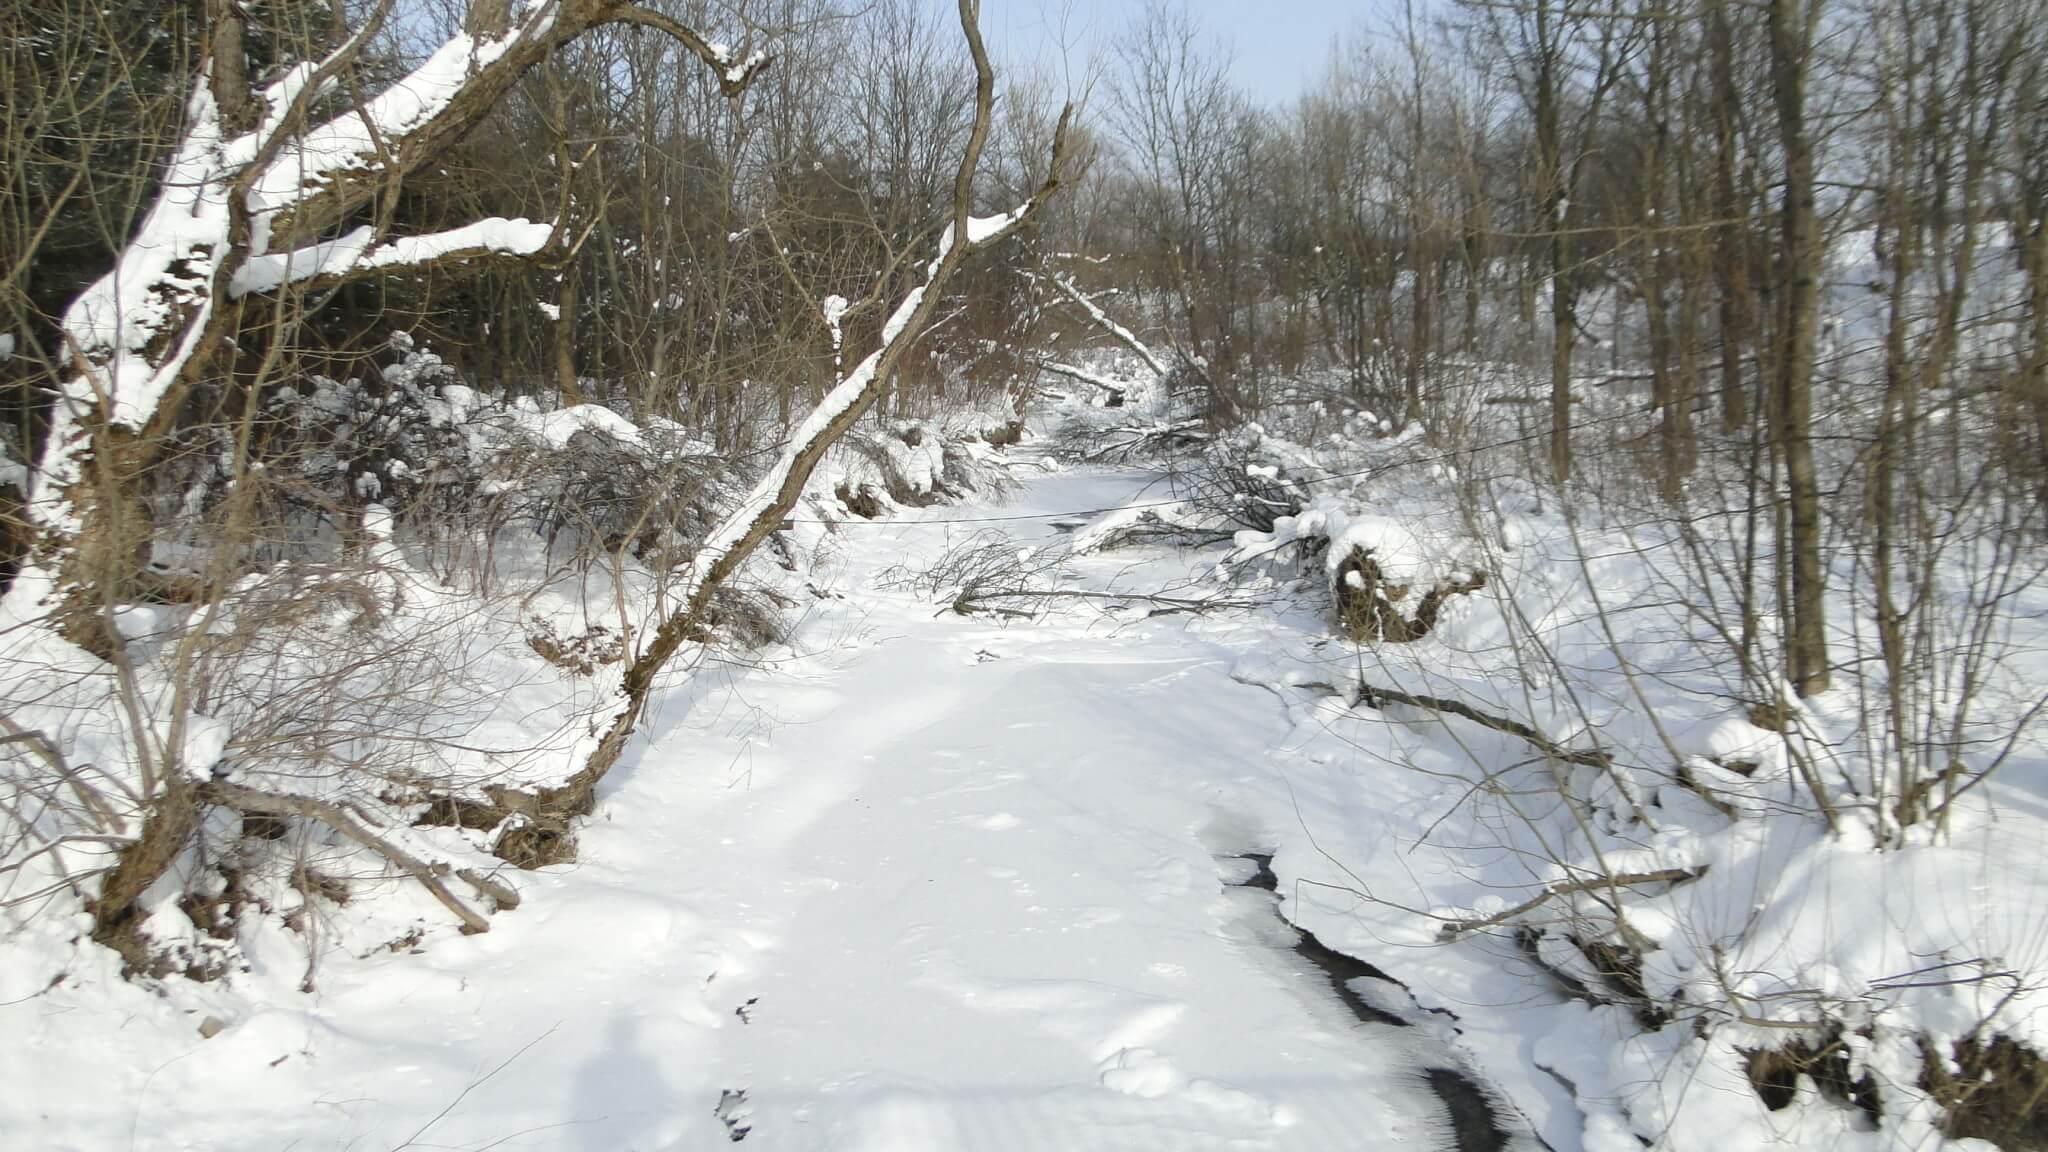 Lutowa zima - śnieżna i mroźna 30